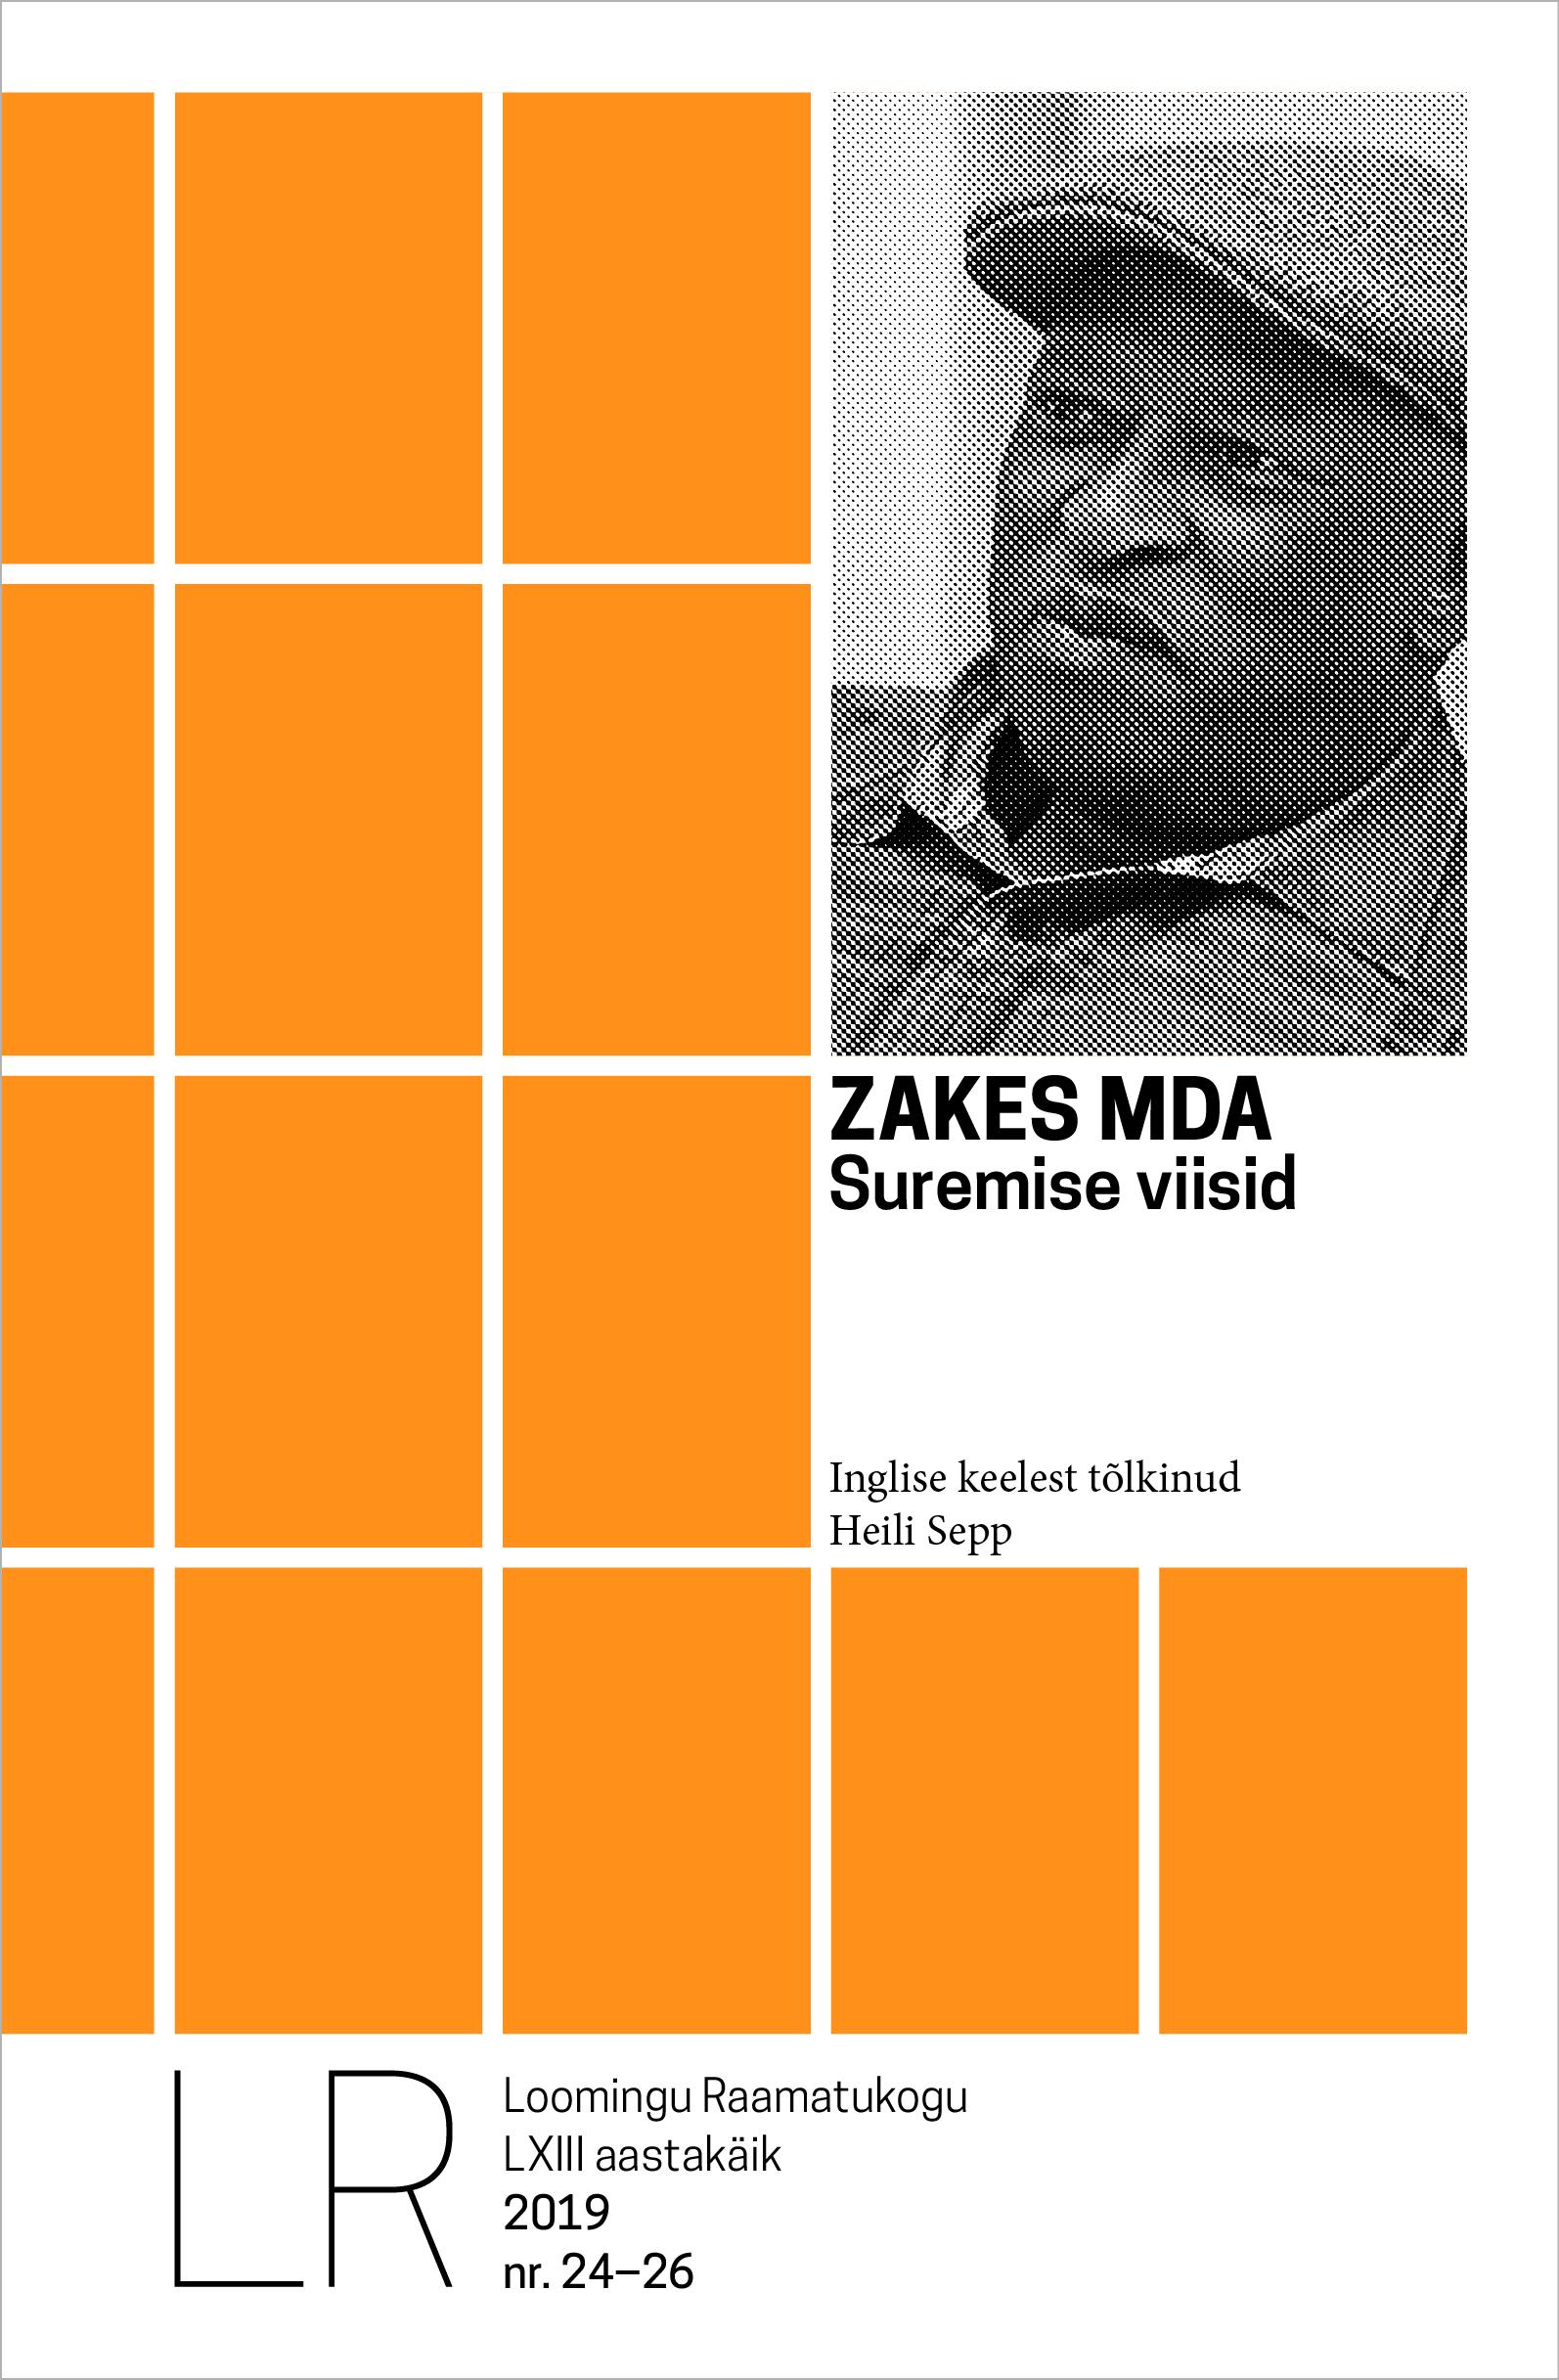 Zakes Mda